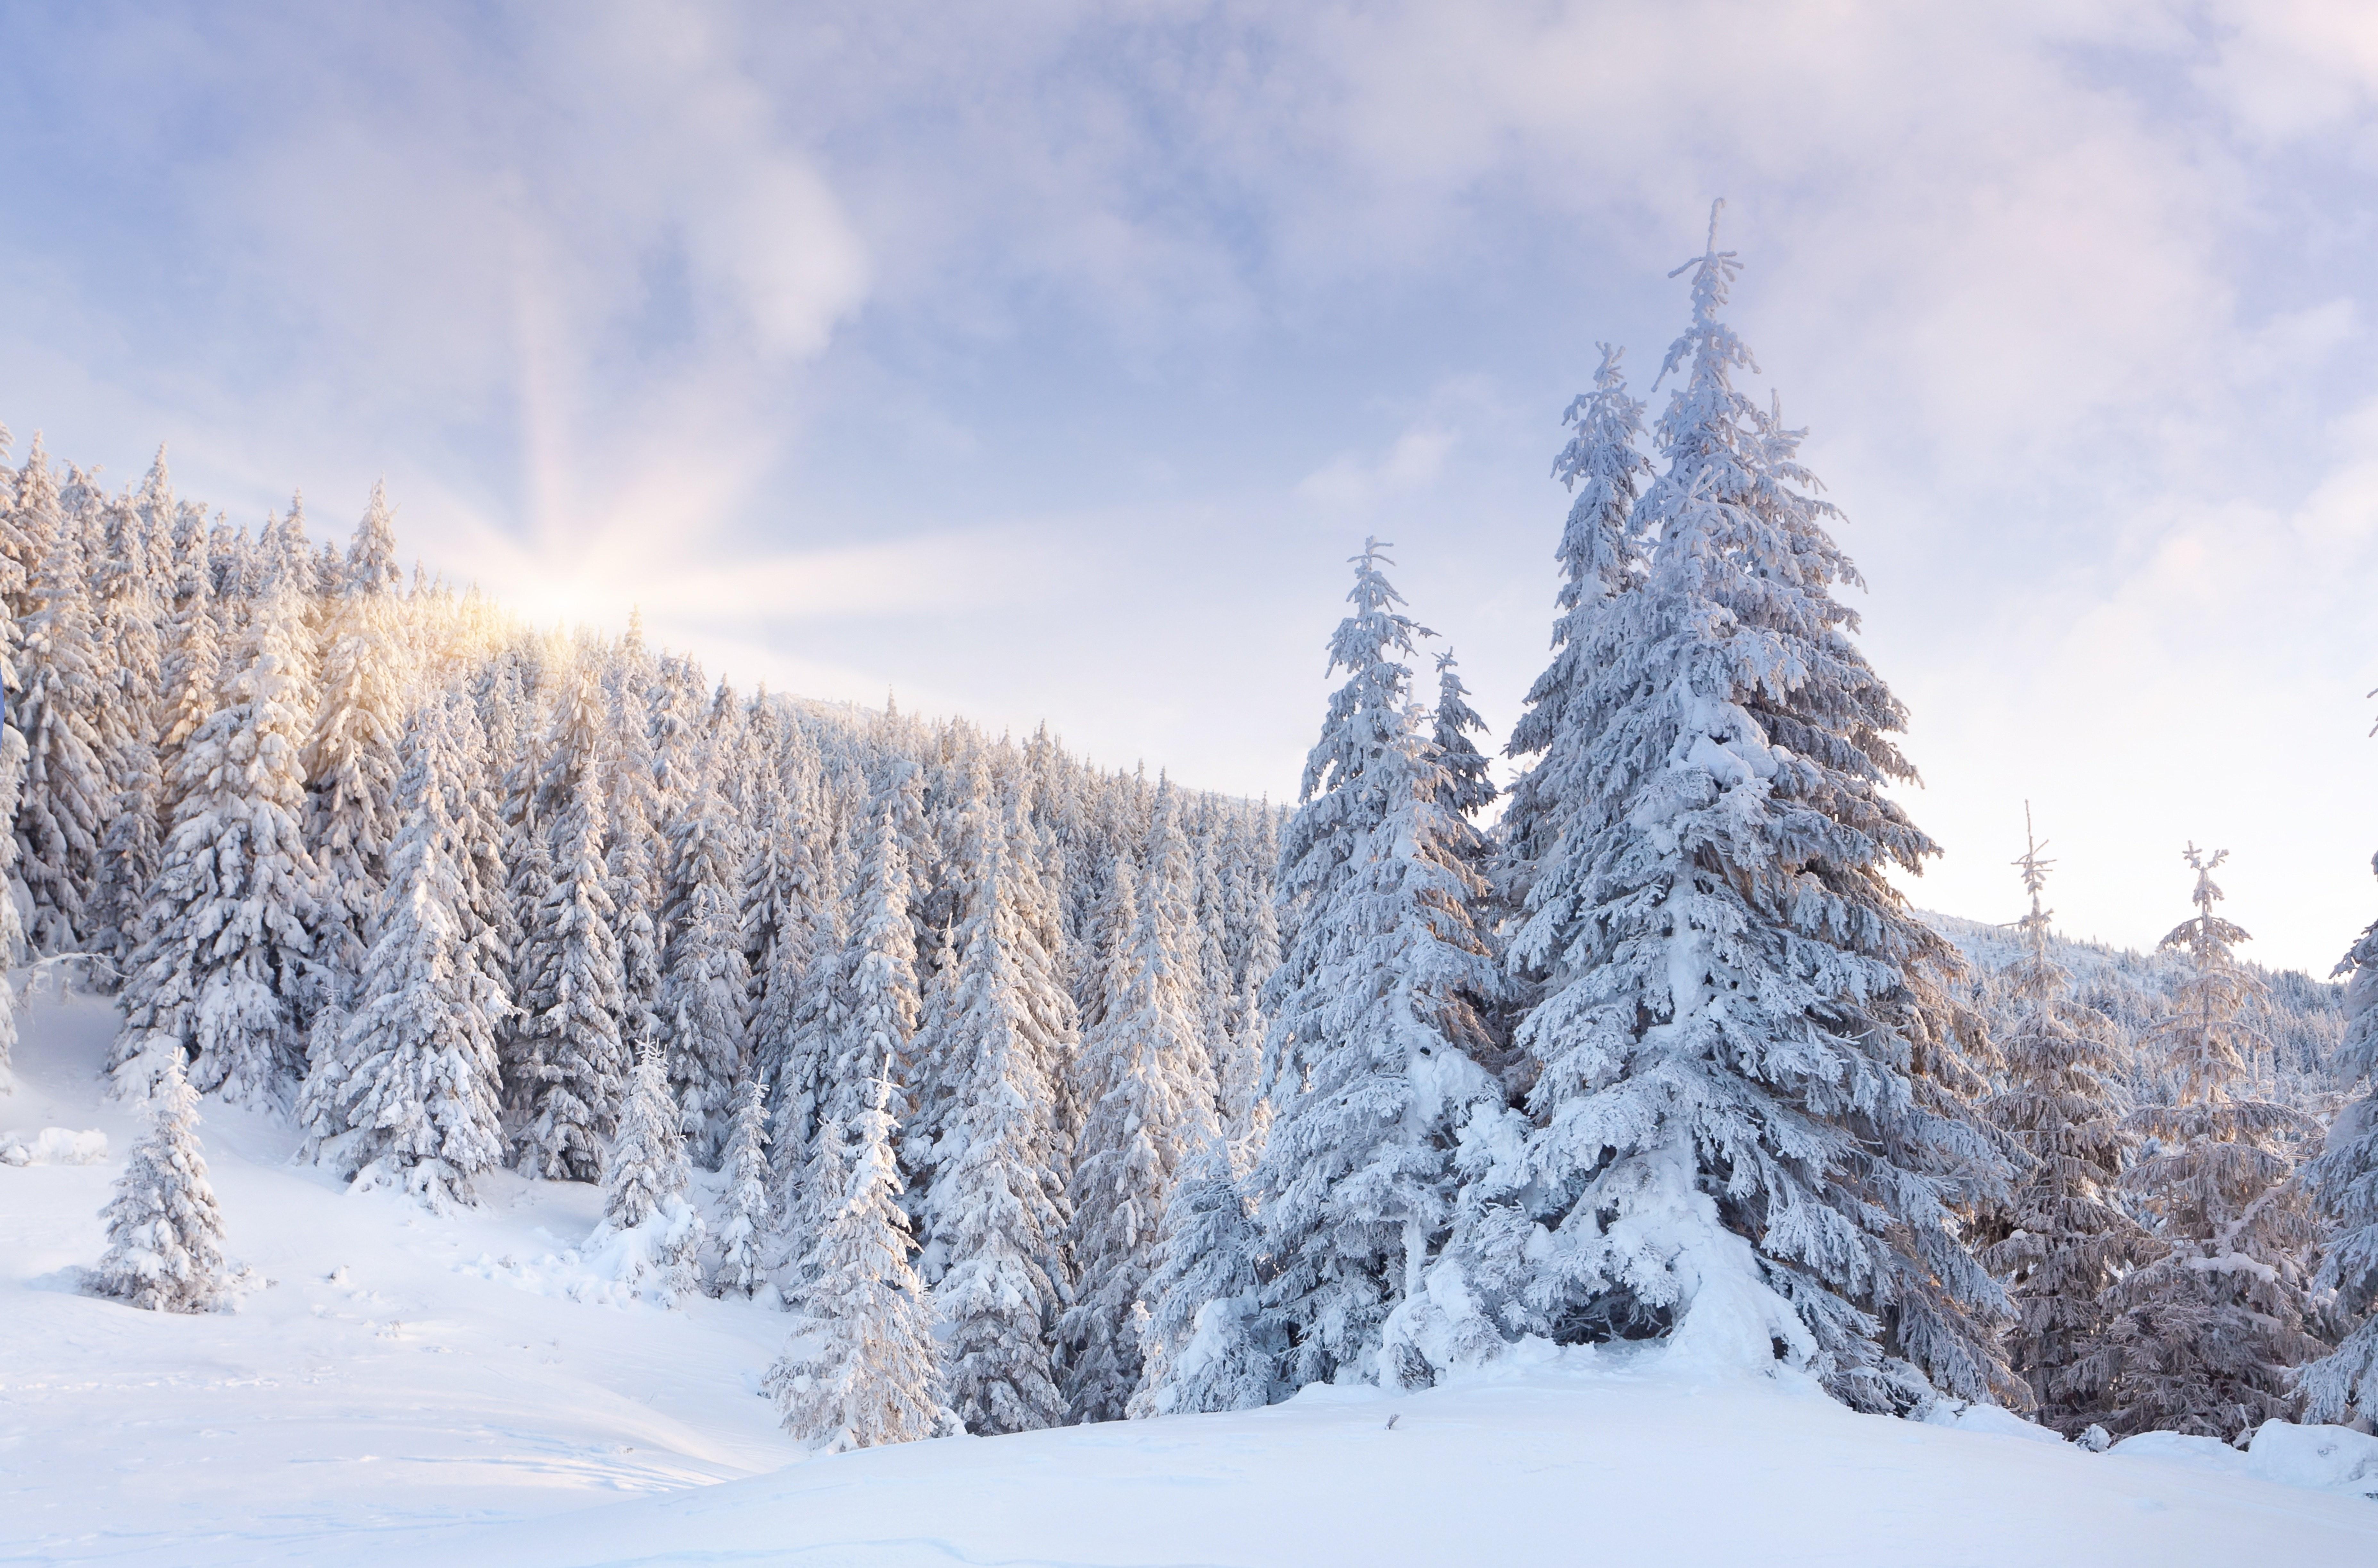 Free Download Macbook Snow Winter Wallpaper Hd Landscape Images Naturefree 7420x4893 For Your Desktop Mobile Tablet Explore 65 Winter Wallpaper Free Free Winter Wallpaper Backgrounds Winter Wallpaper Free Winter